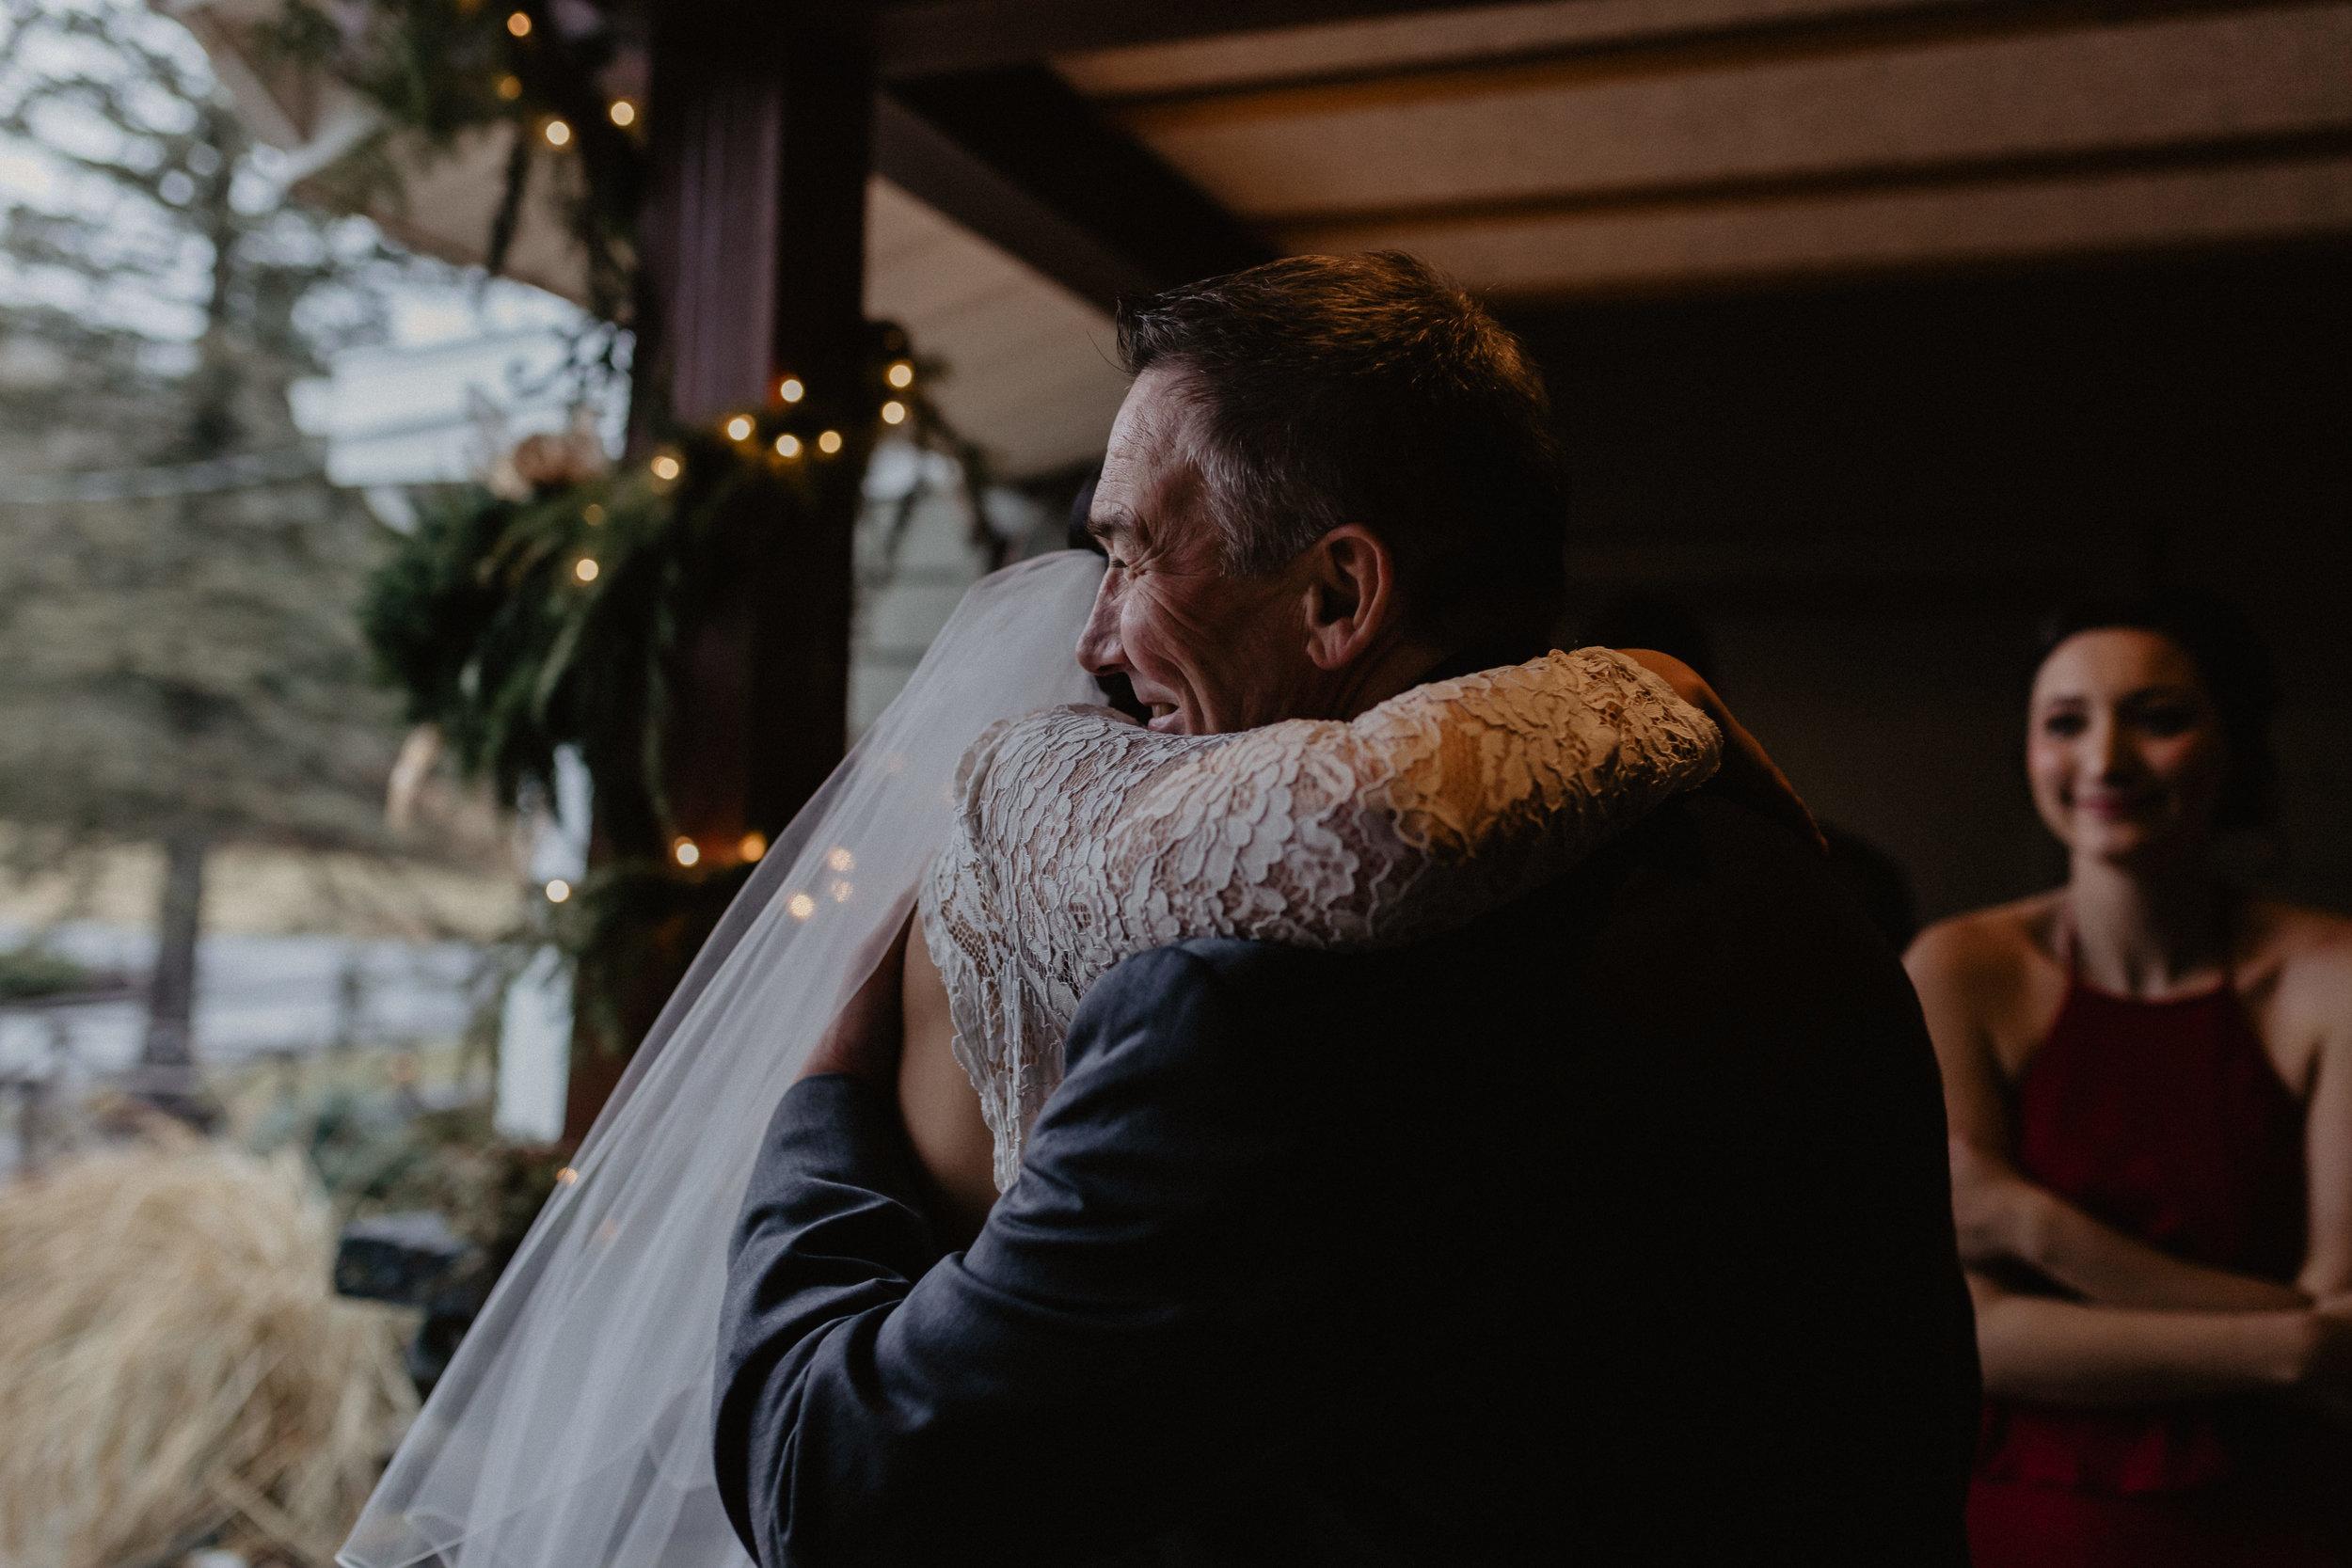 old_daley_on_crooked_lake_wedding_035.jpg